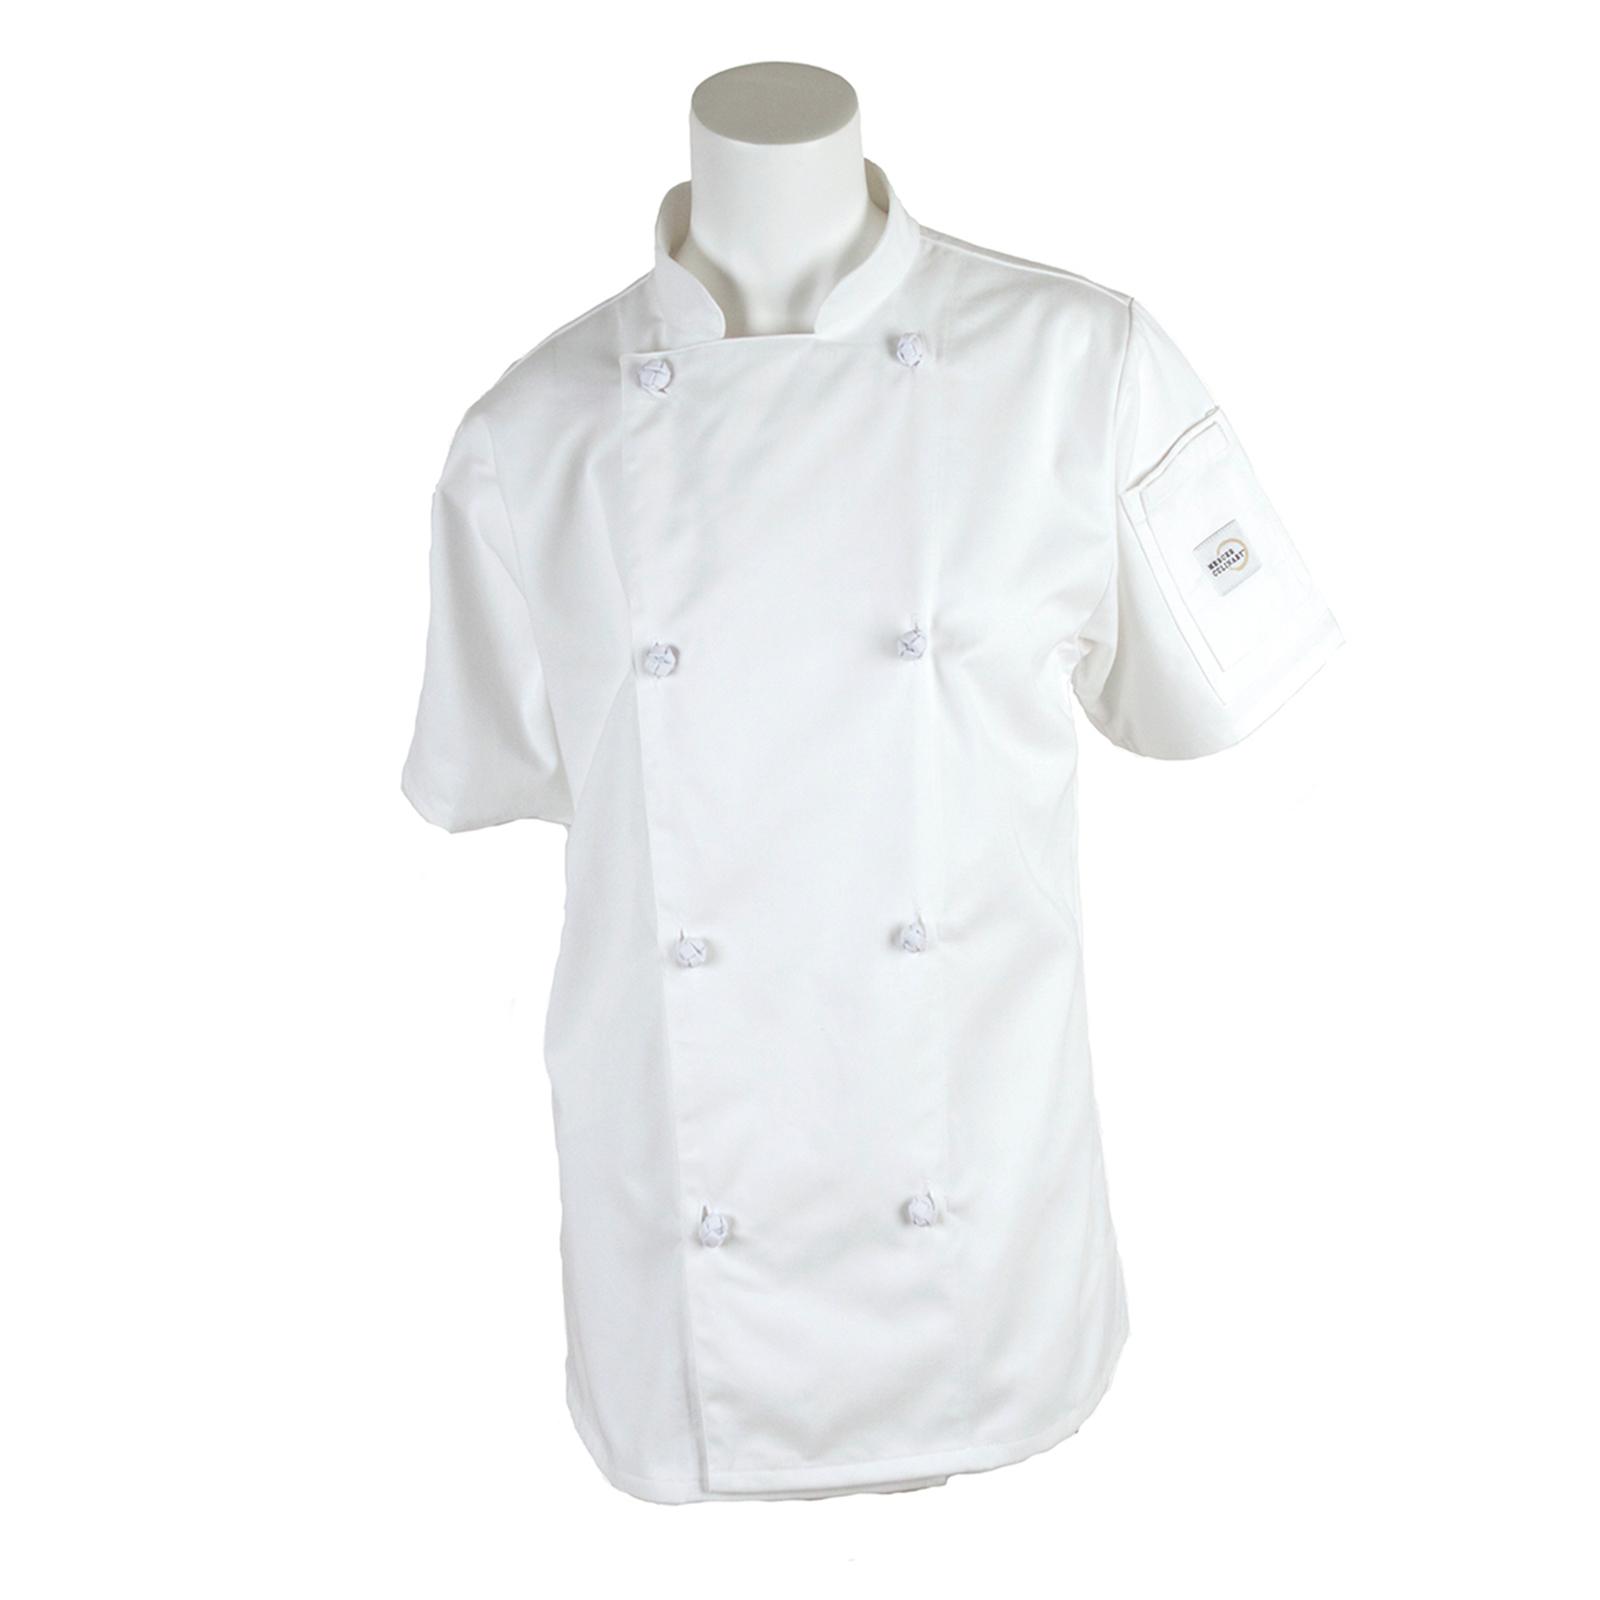 Mercer Culinary M61042WHM chef's coat